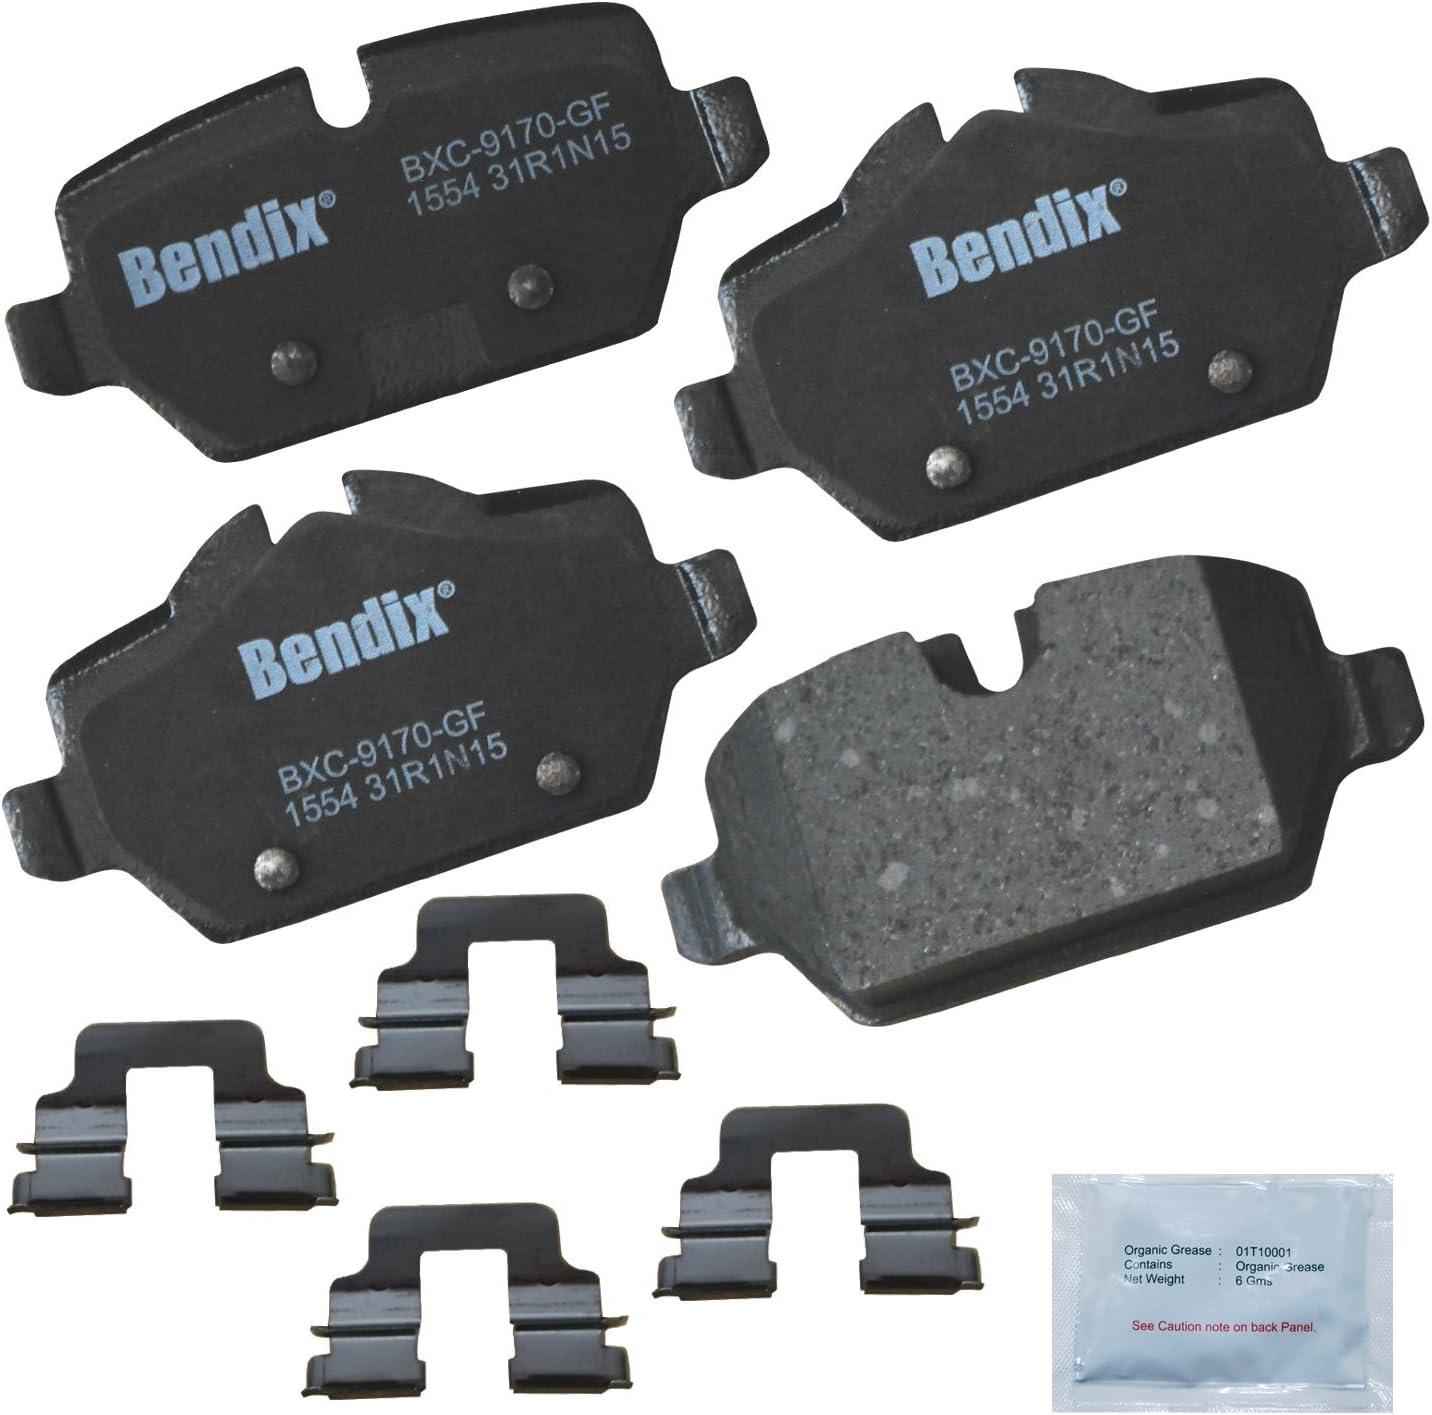 with Installation Hardware Rear Bendix Premium Copper Free CFC1554 Premium Copper Free Ceramic Brake Pad